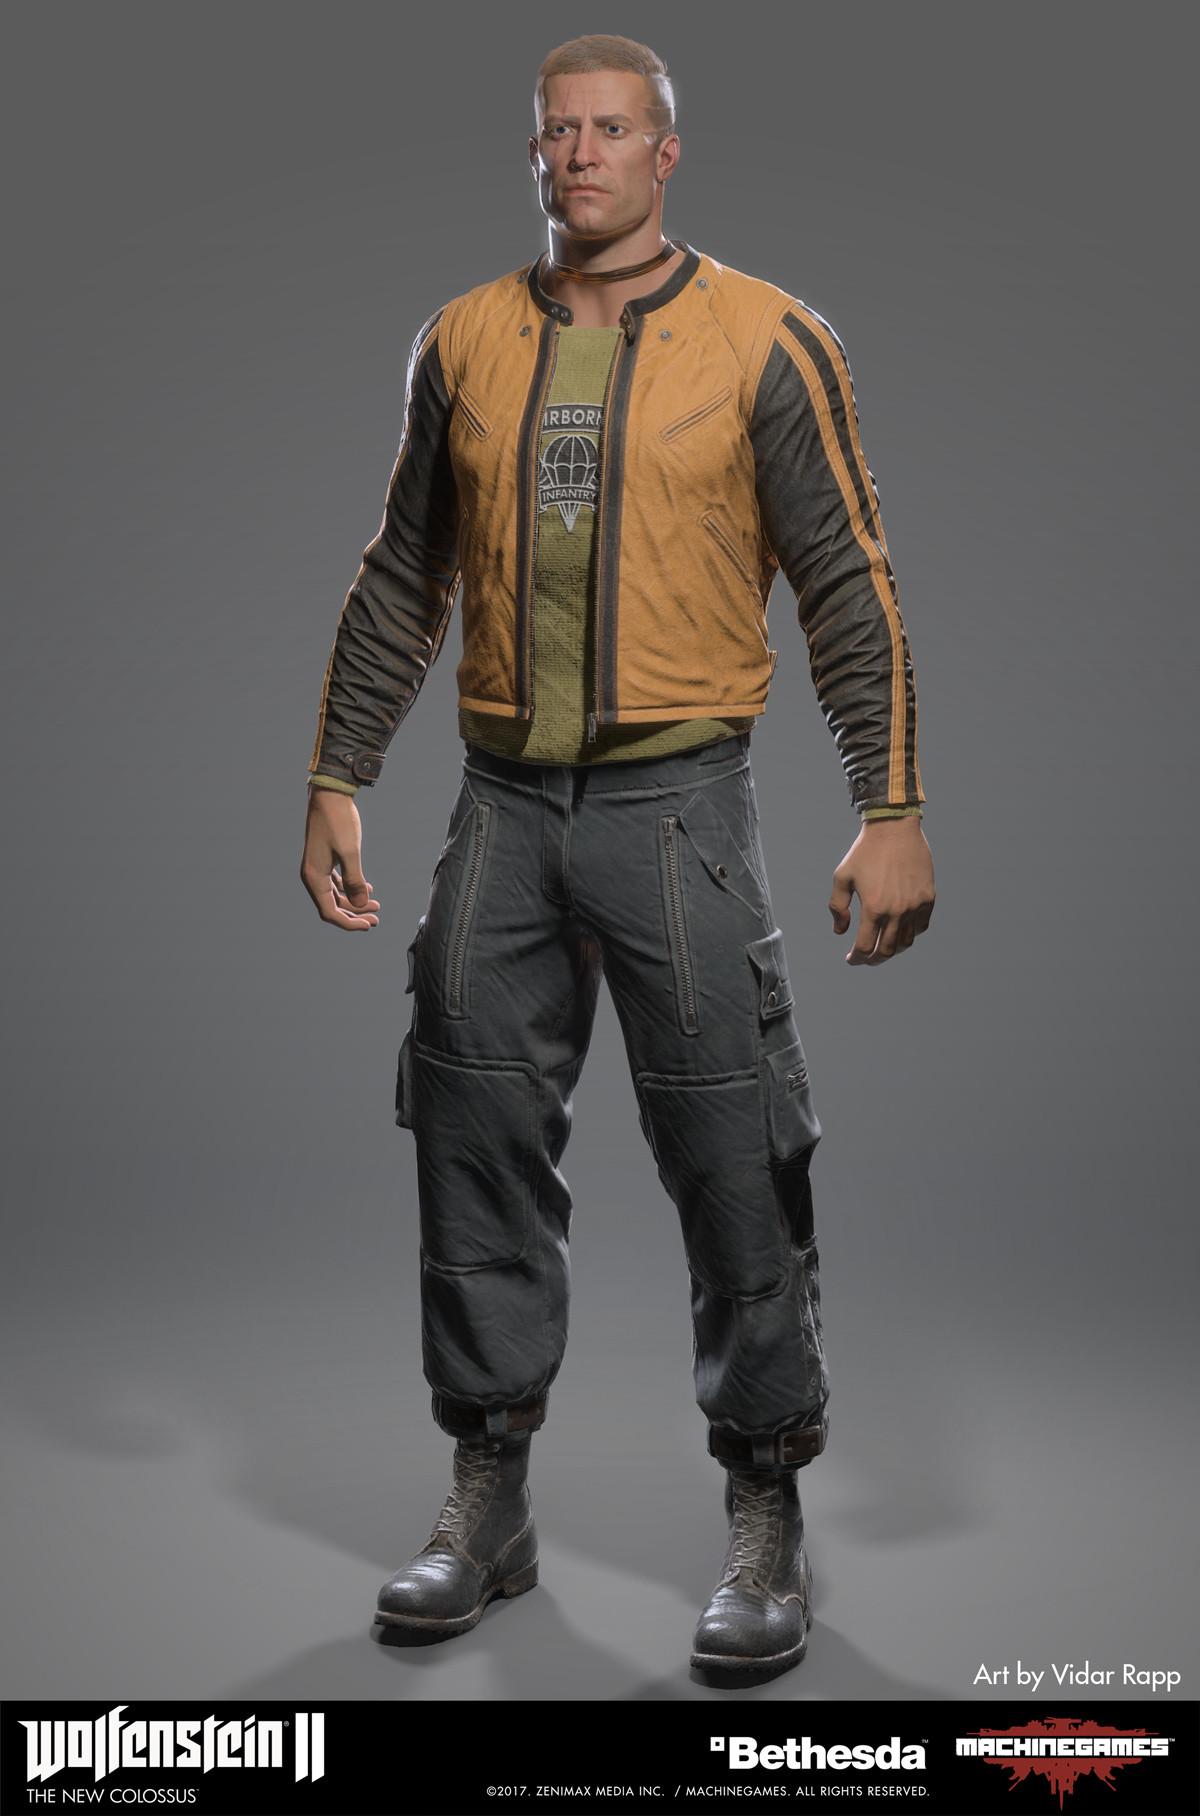 Vidar rapp blazkowicz new jacket front